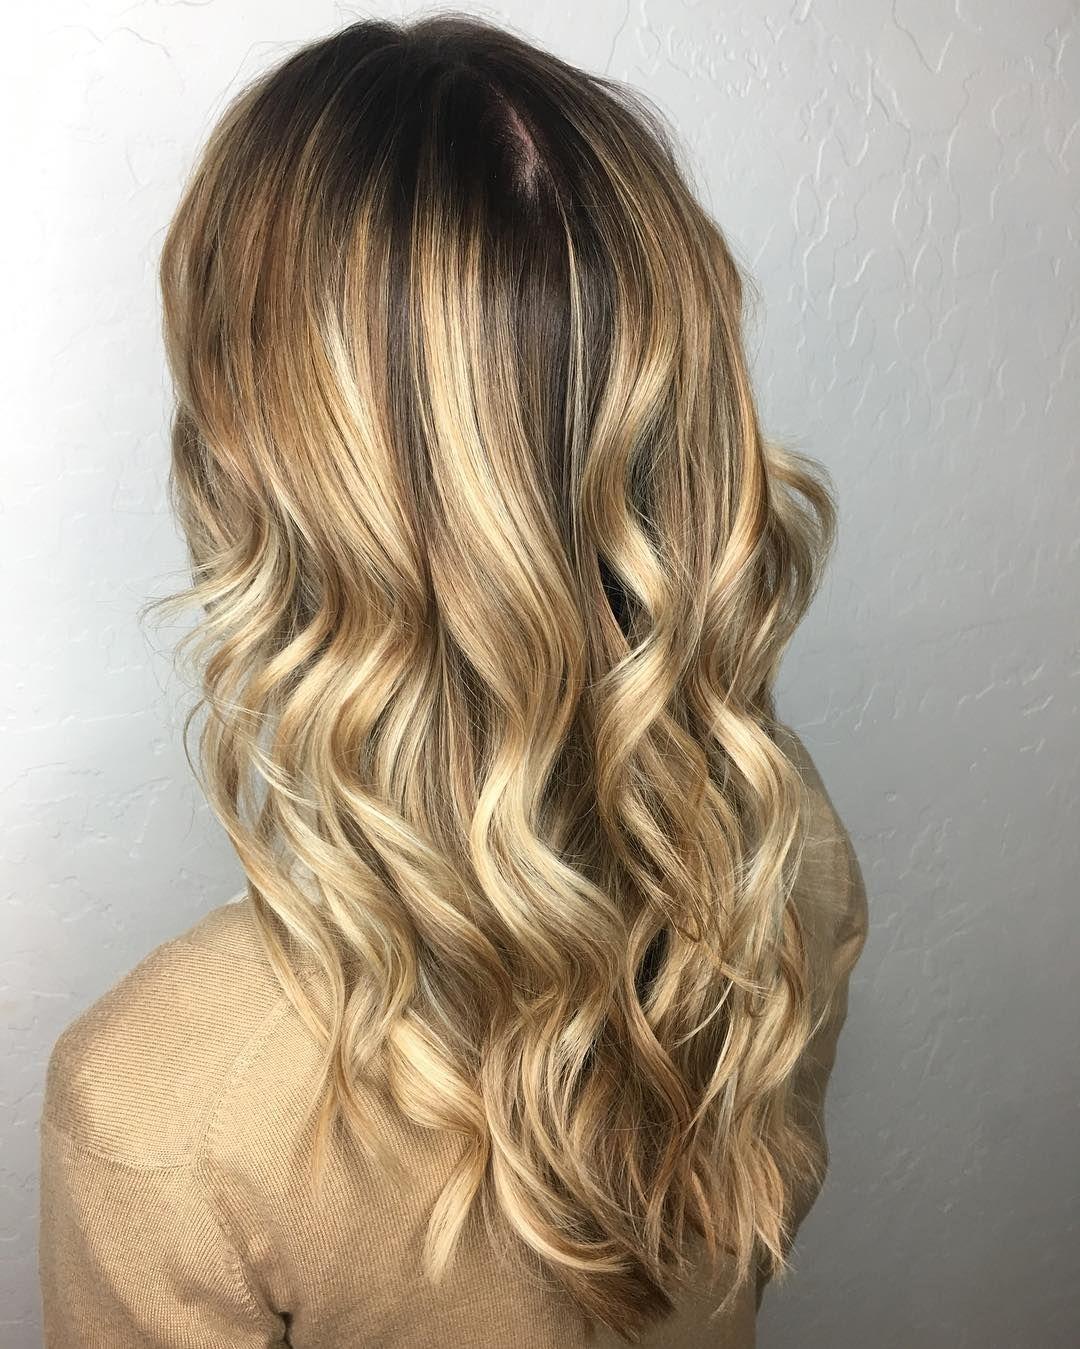 awesome 40 Striking Golden Blond Hair Ideas - Sexy Ways to Go Blonde Check more at http://newaylook.com/best-golden-blond-hair-ideas/